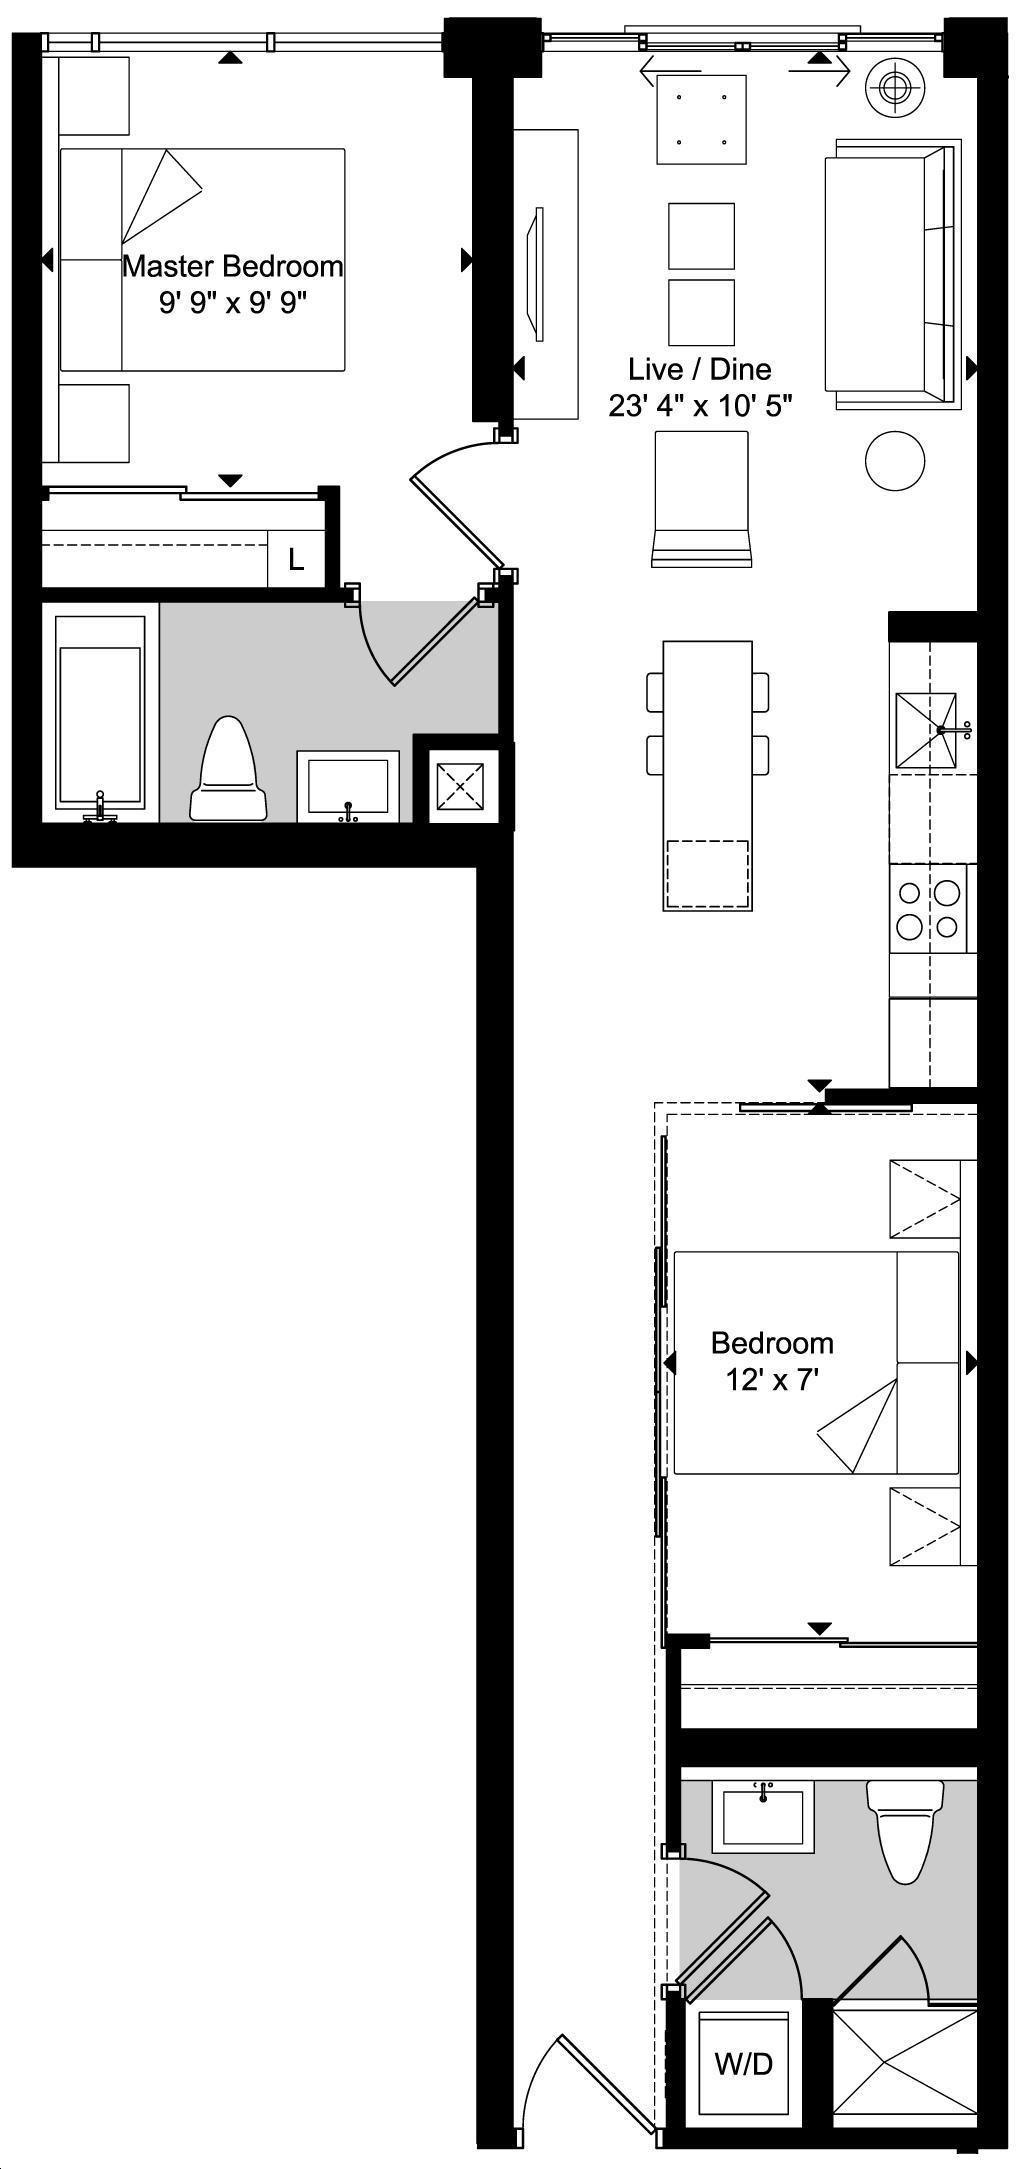 Art Condos By Triangle West D2 Floorplan 2 Bed 2 Bath